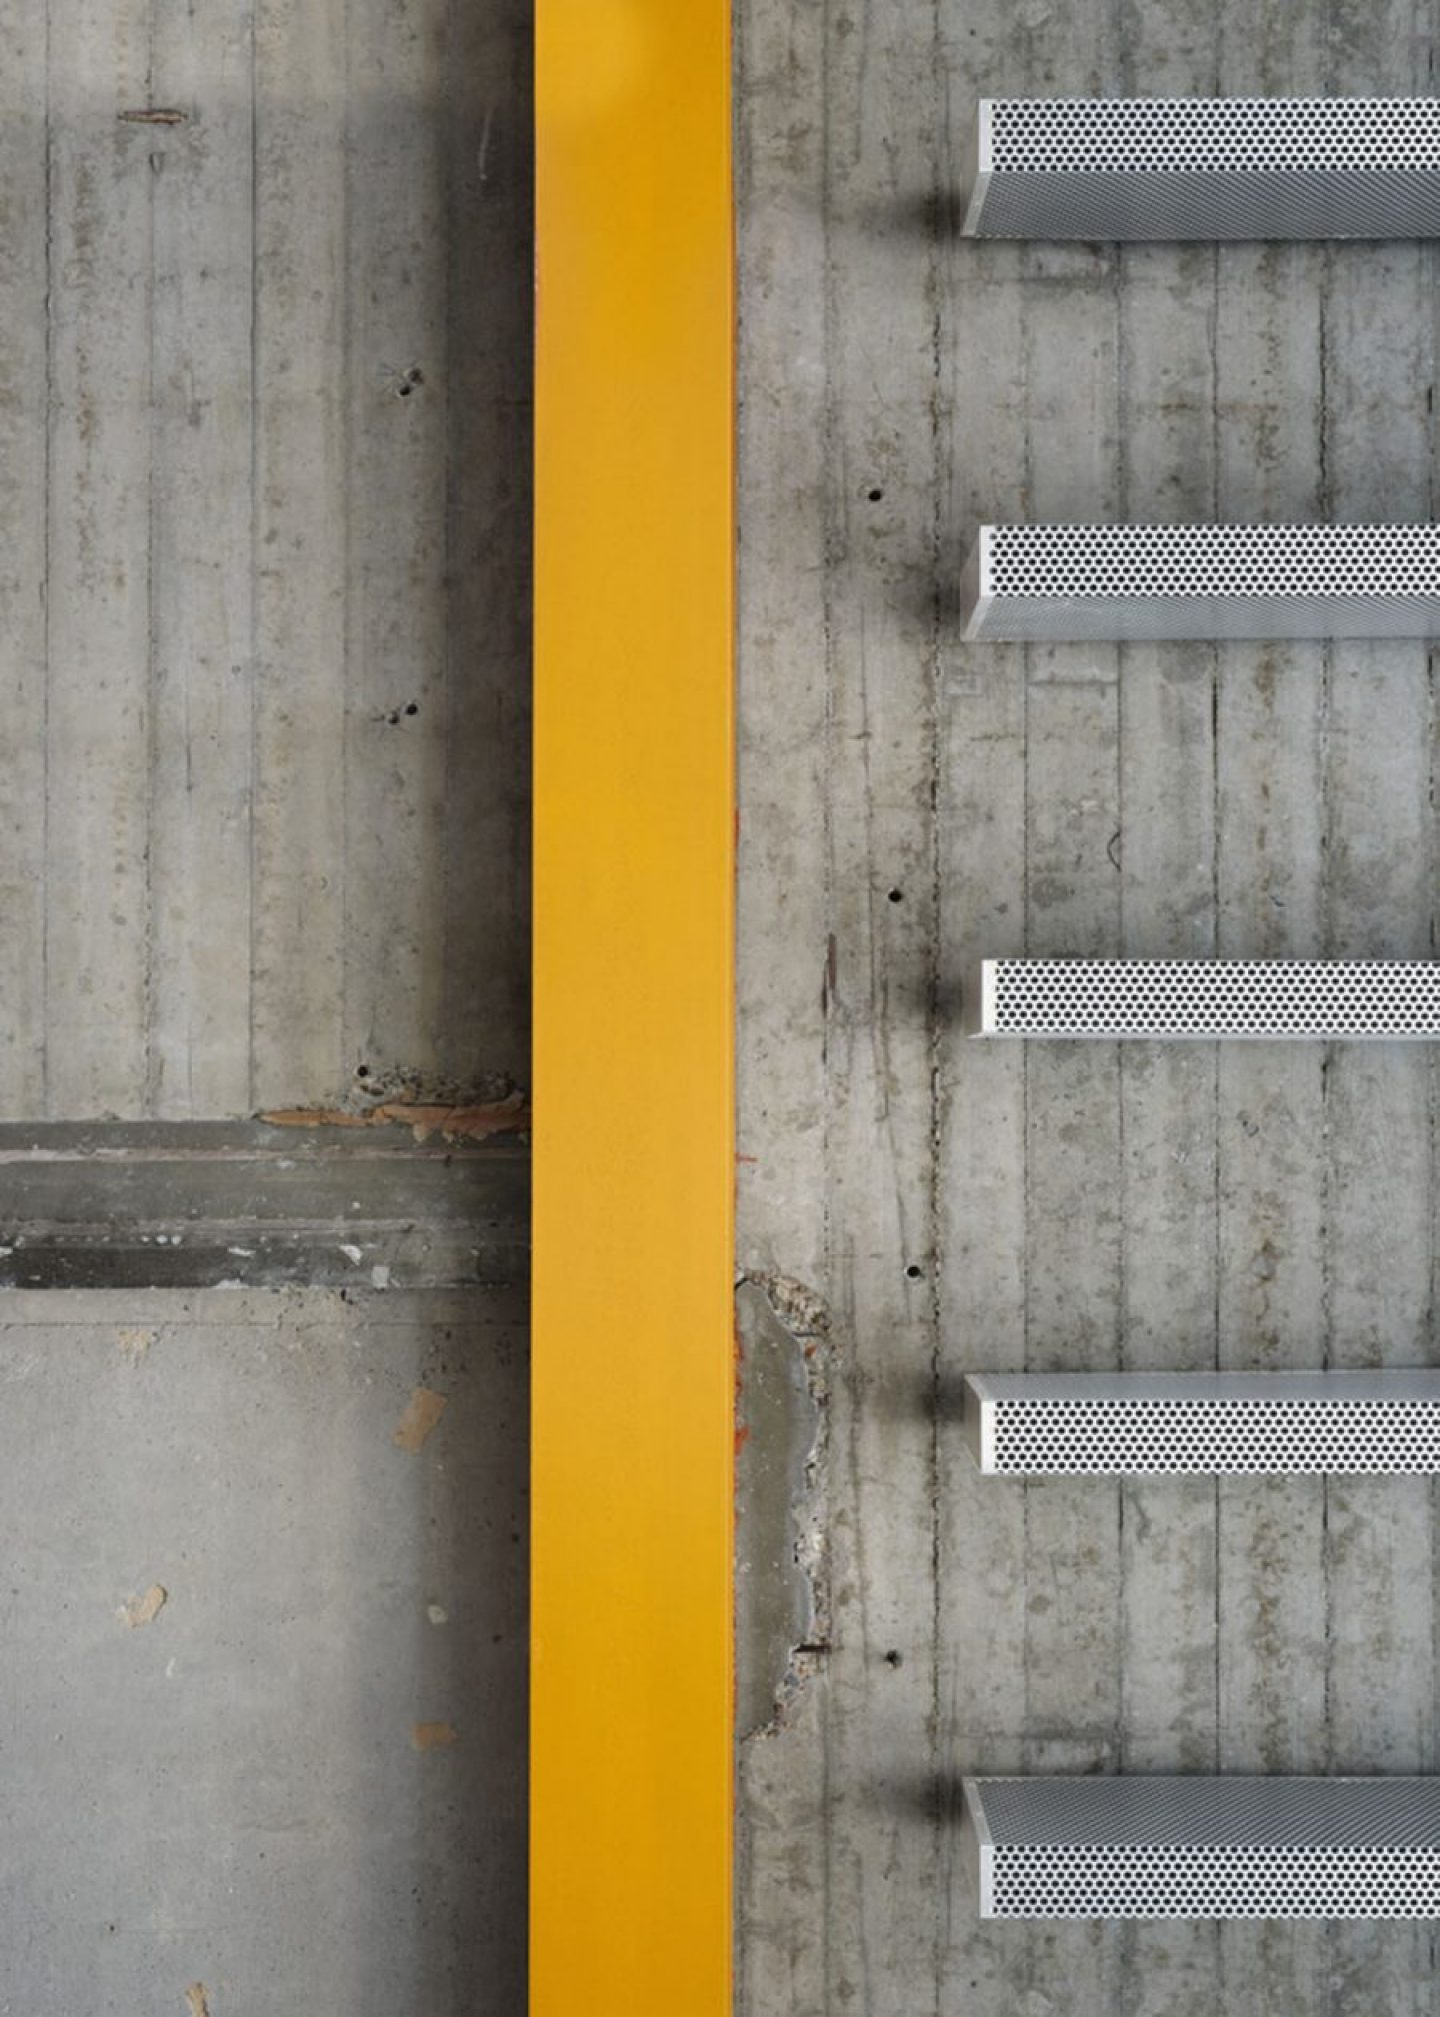 Architecture-RestaurantOldScuola-Rotterdam-03